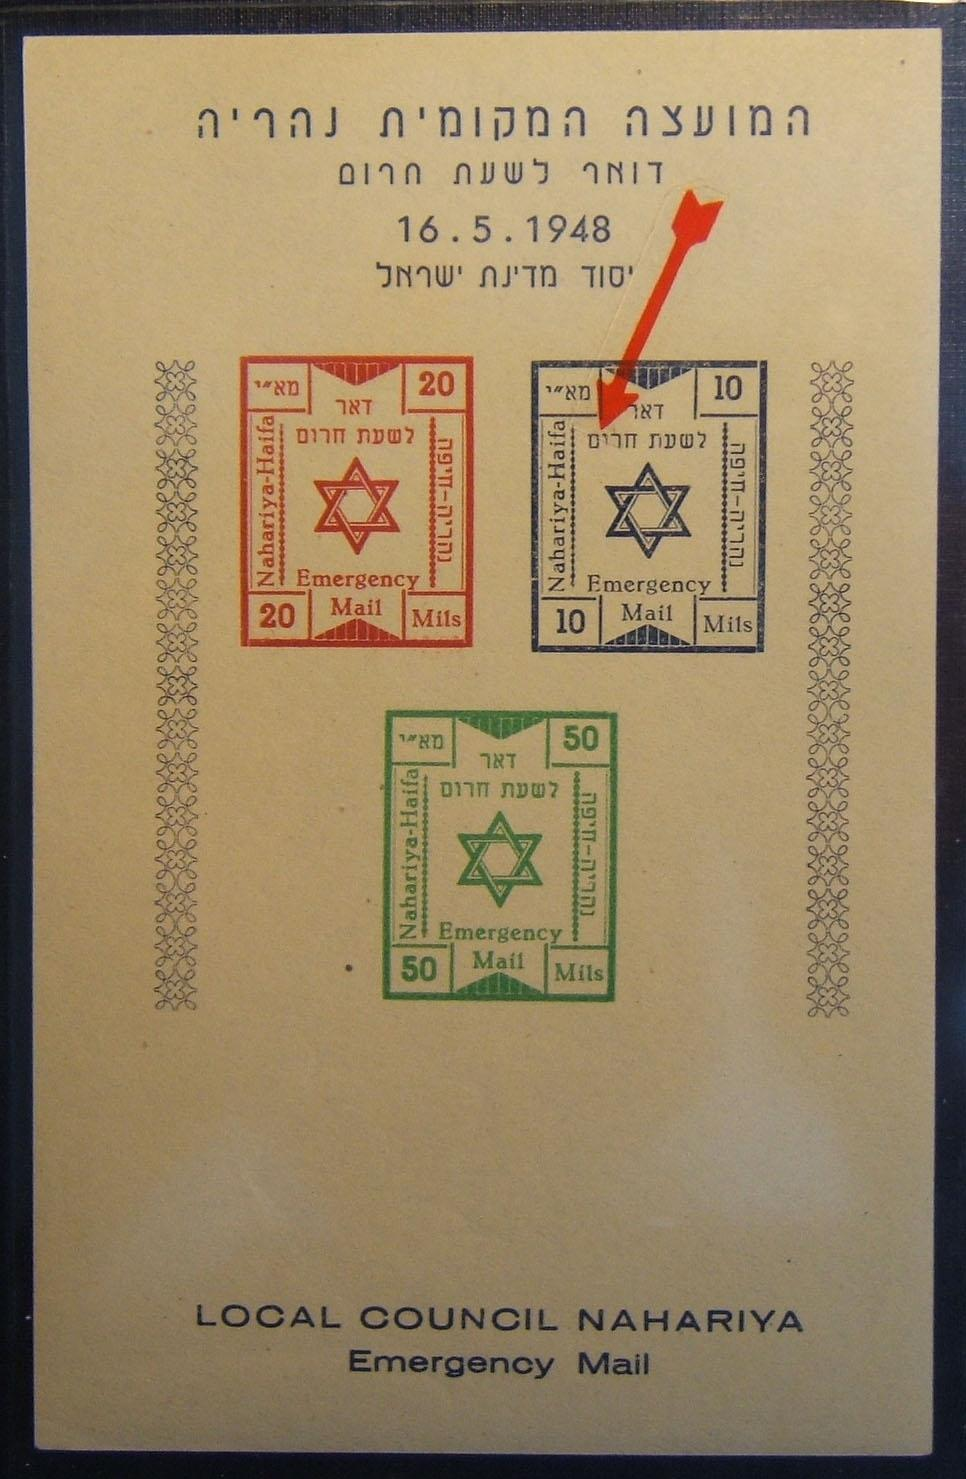 Nahariya Notfall Örtliche-2, Post Souvenirblatt mit kurzem